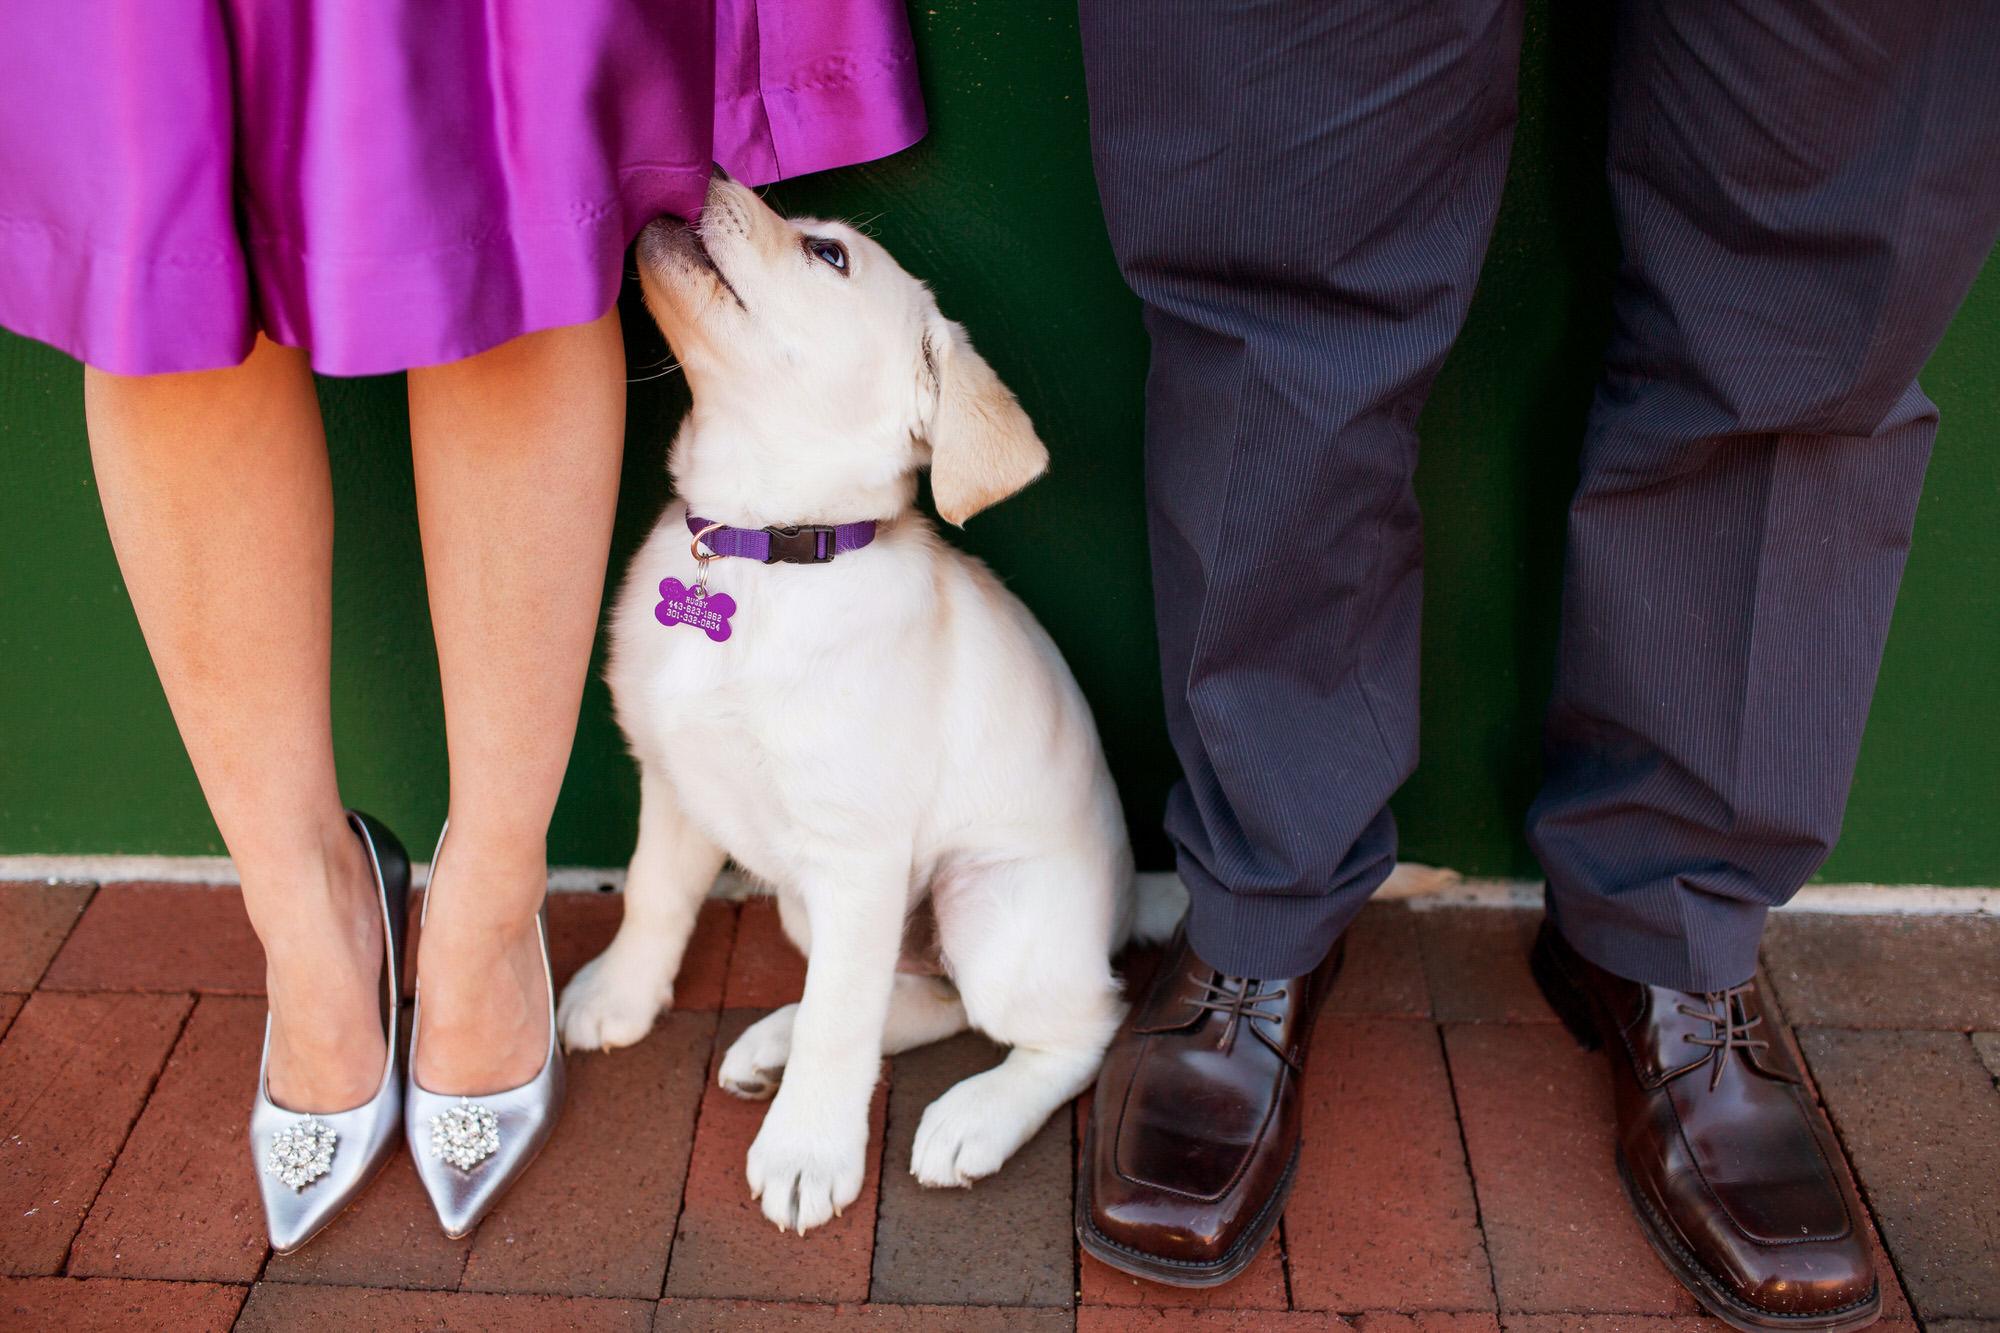 Cute dog looks up skirl - photo by Ken Pak